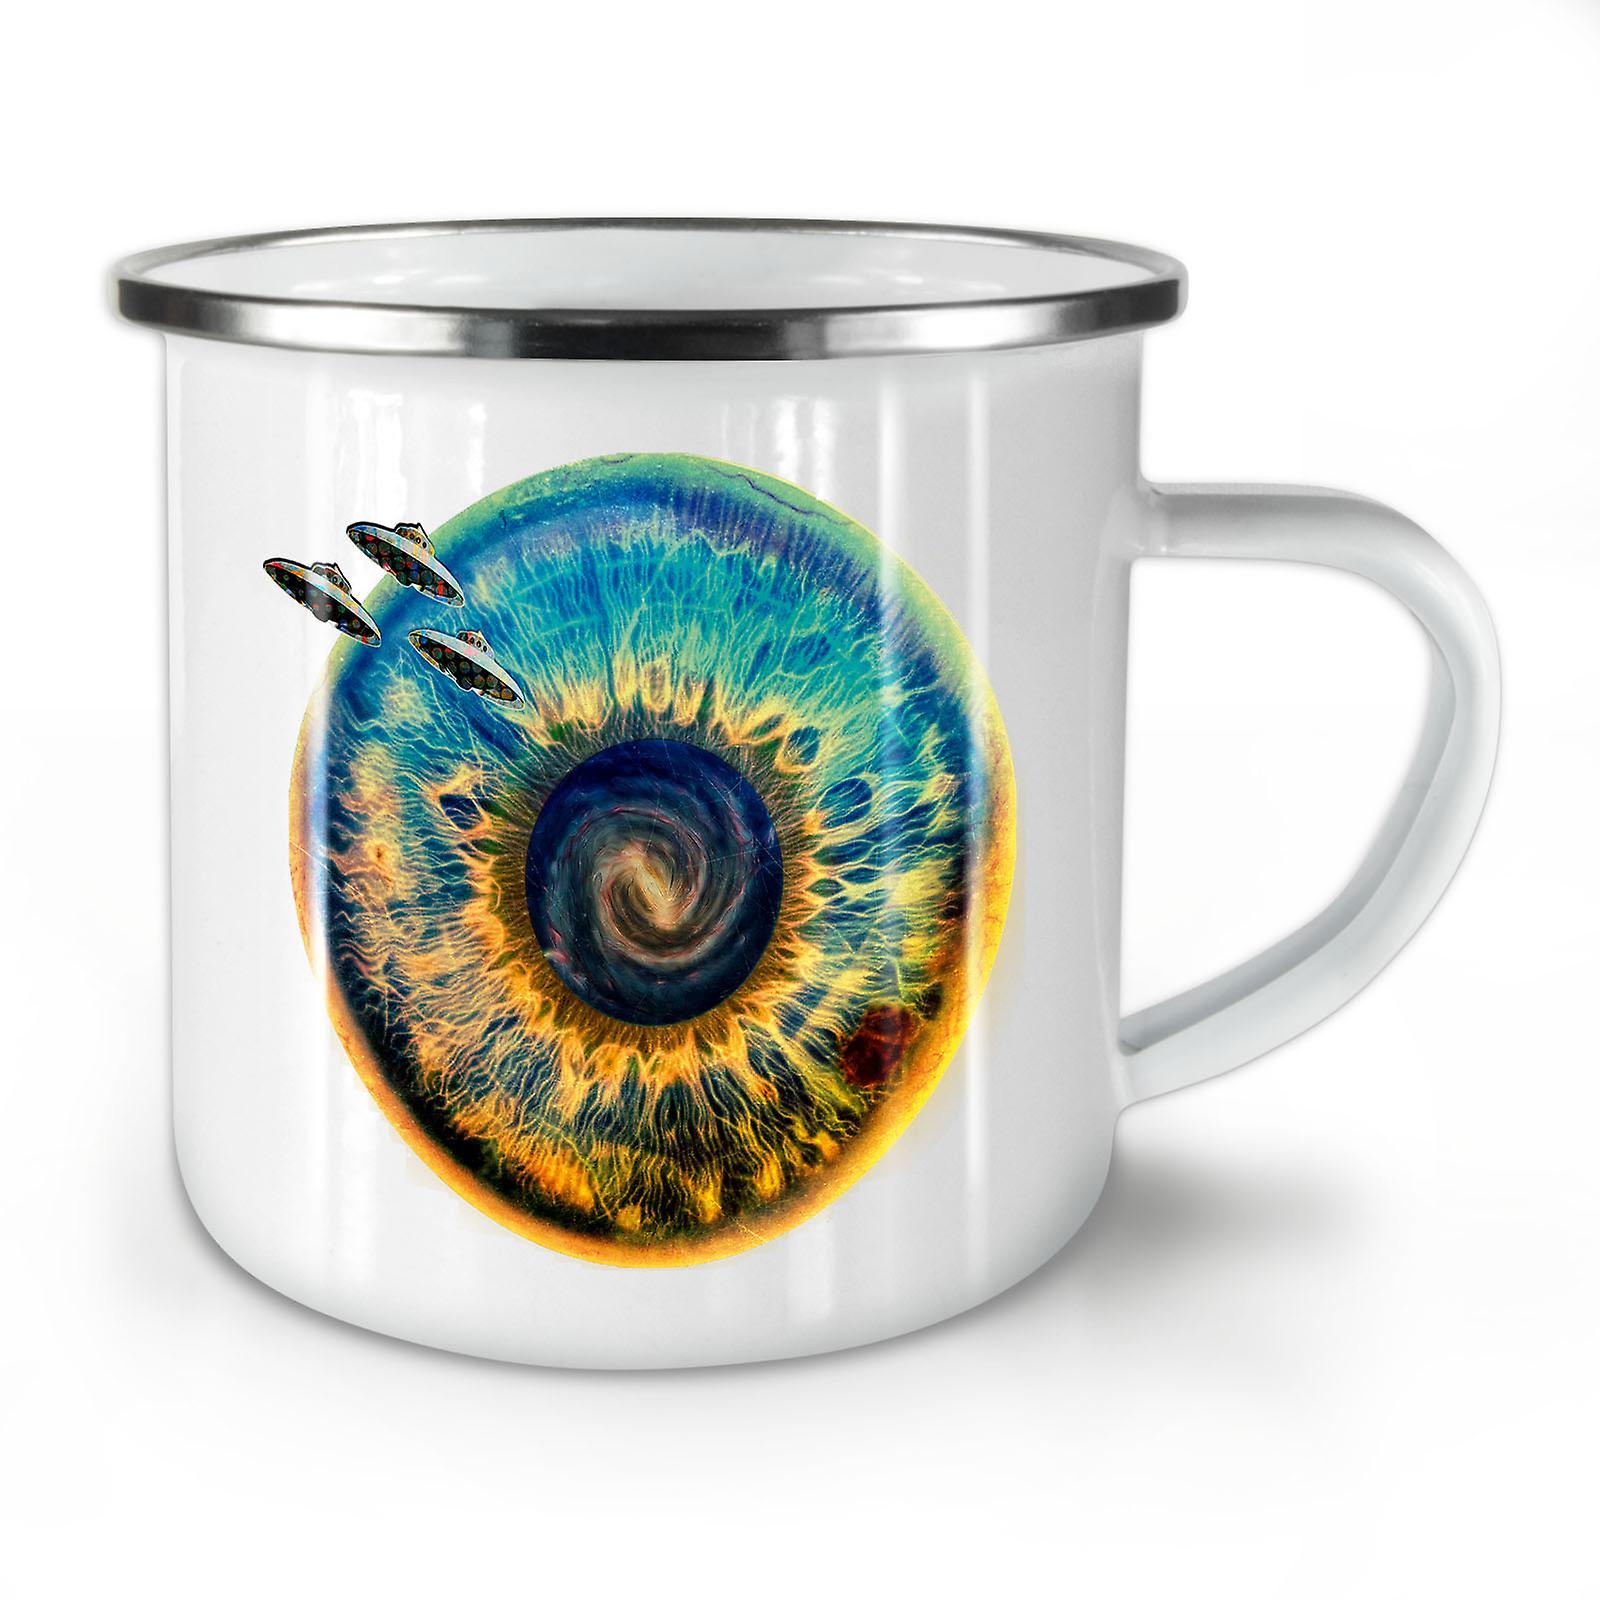 Whitetea Coffee Spaceship Enamel Being Space OzWellcoda New Mug10 OX0NnwPk8